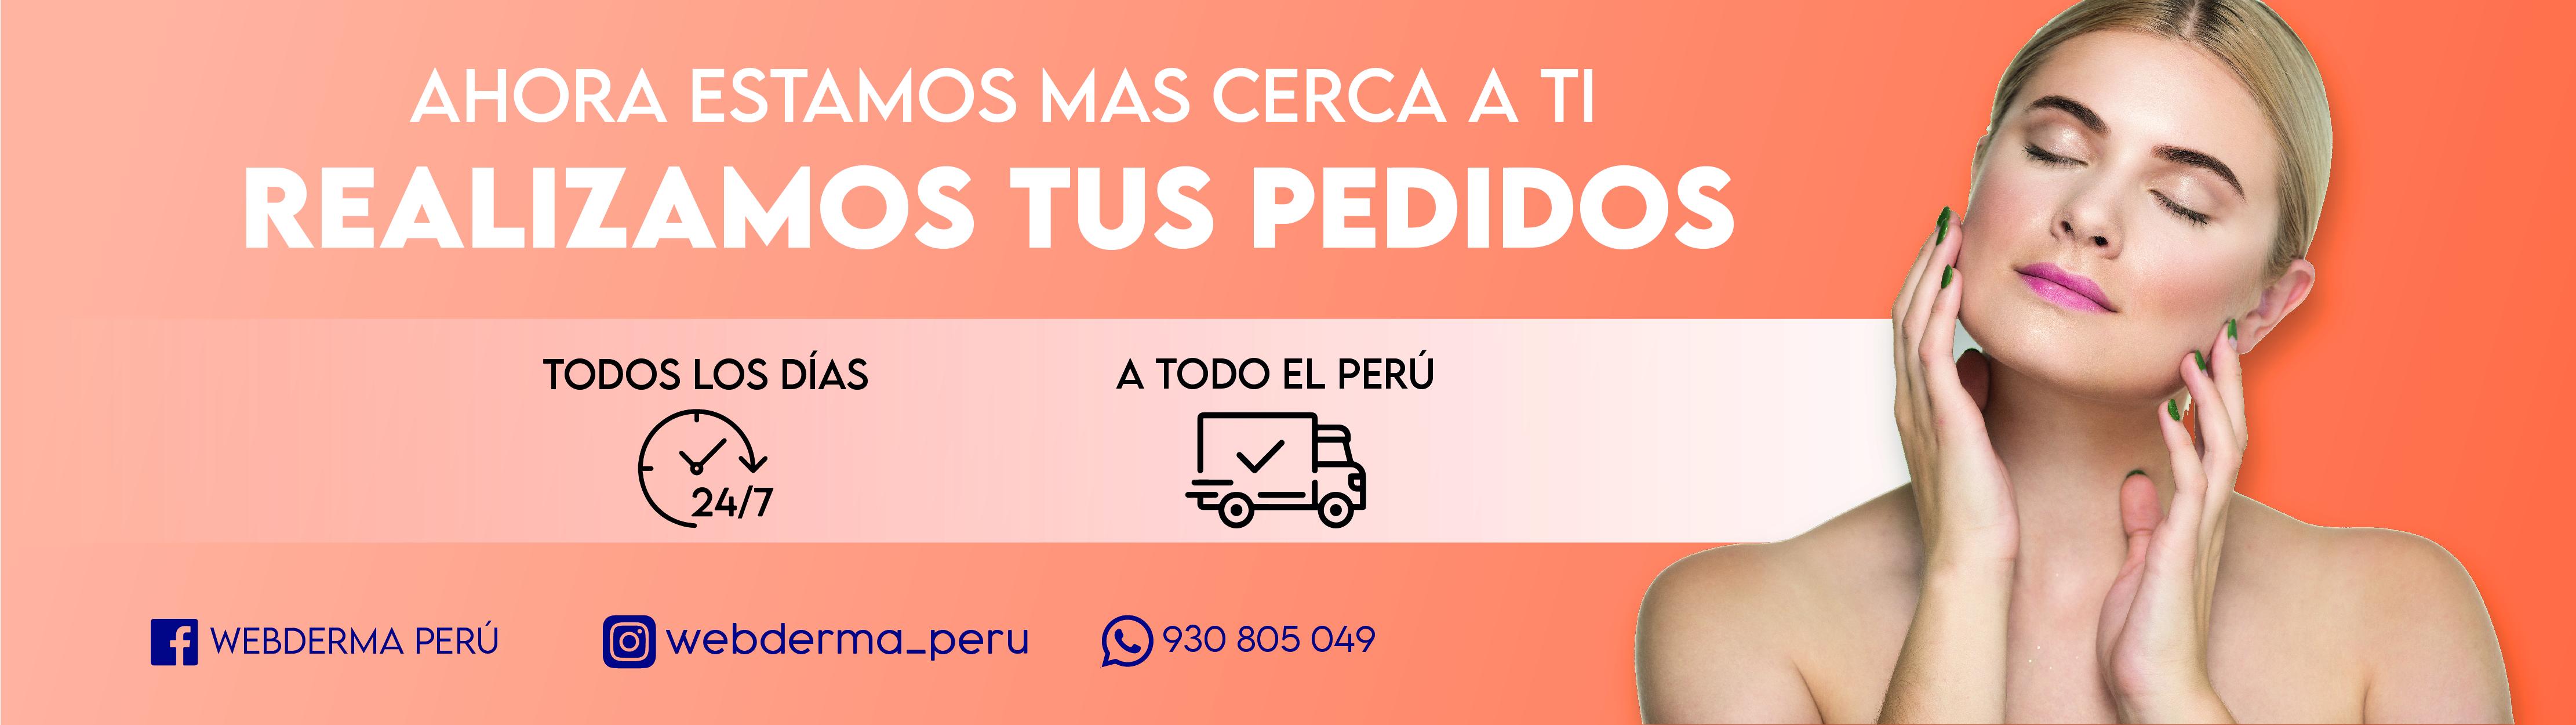 Heliocare - WebDerma Perú